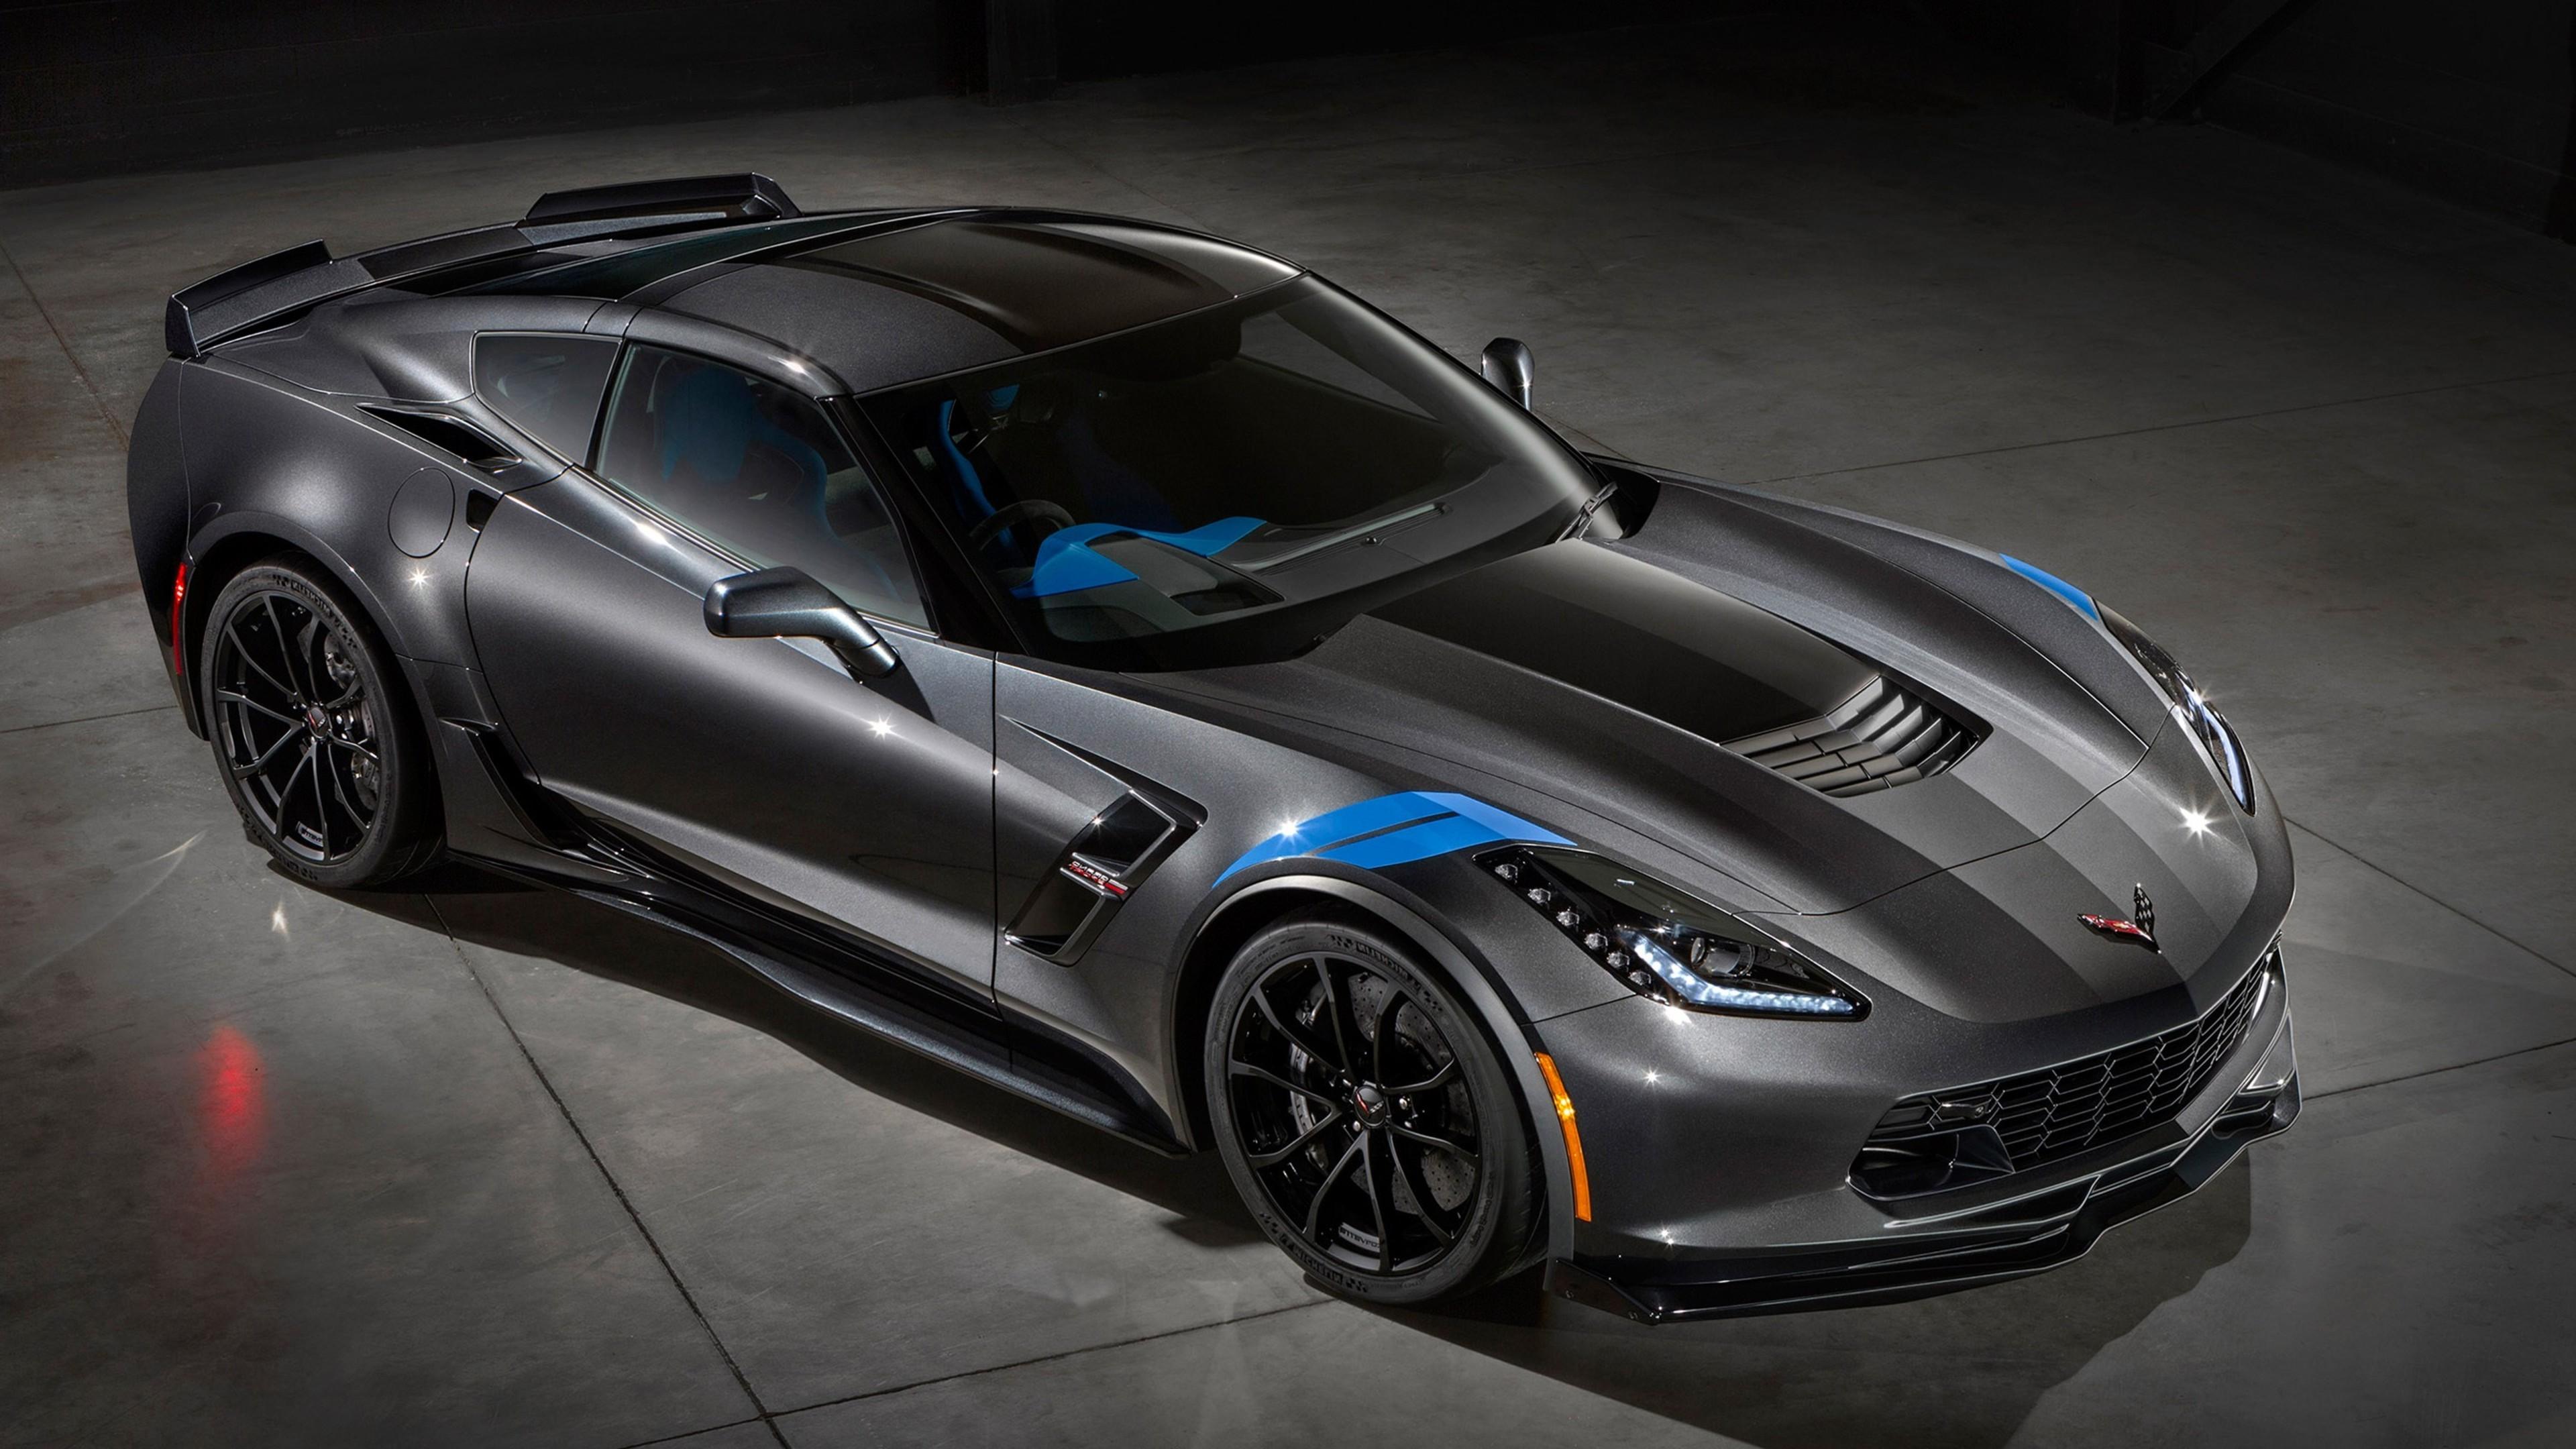 1080x1920 1080x1920 Wallpaper chevrolet corvette zr1, chevrolet, cars